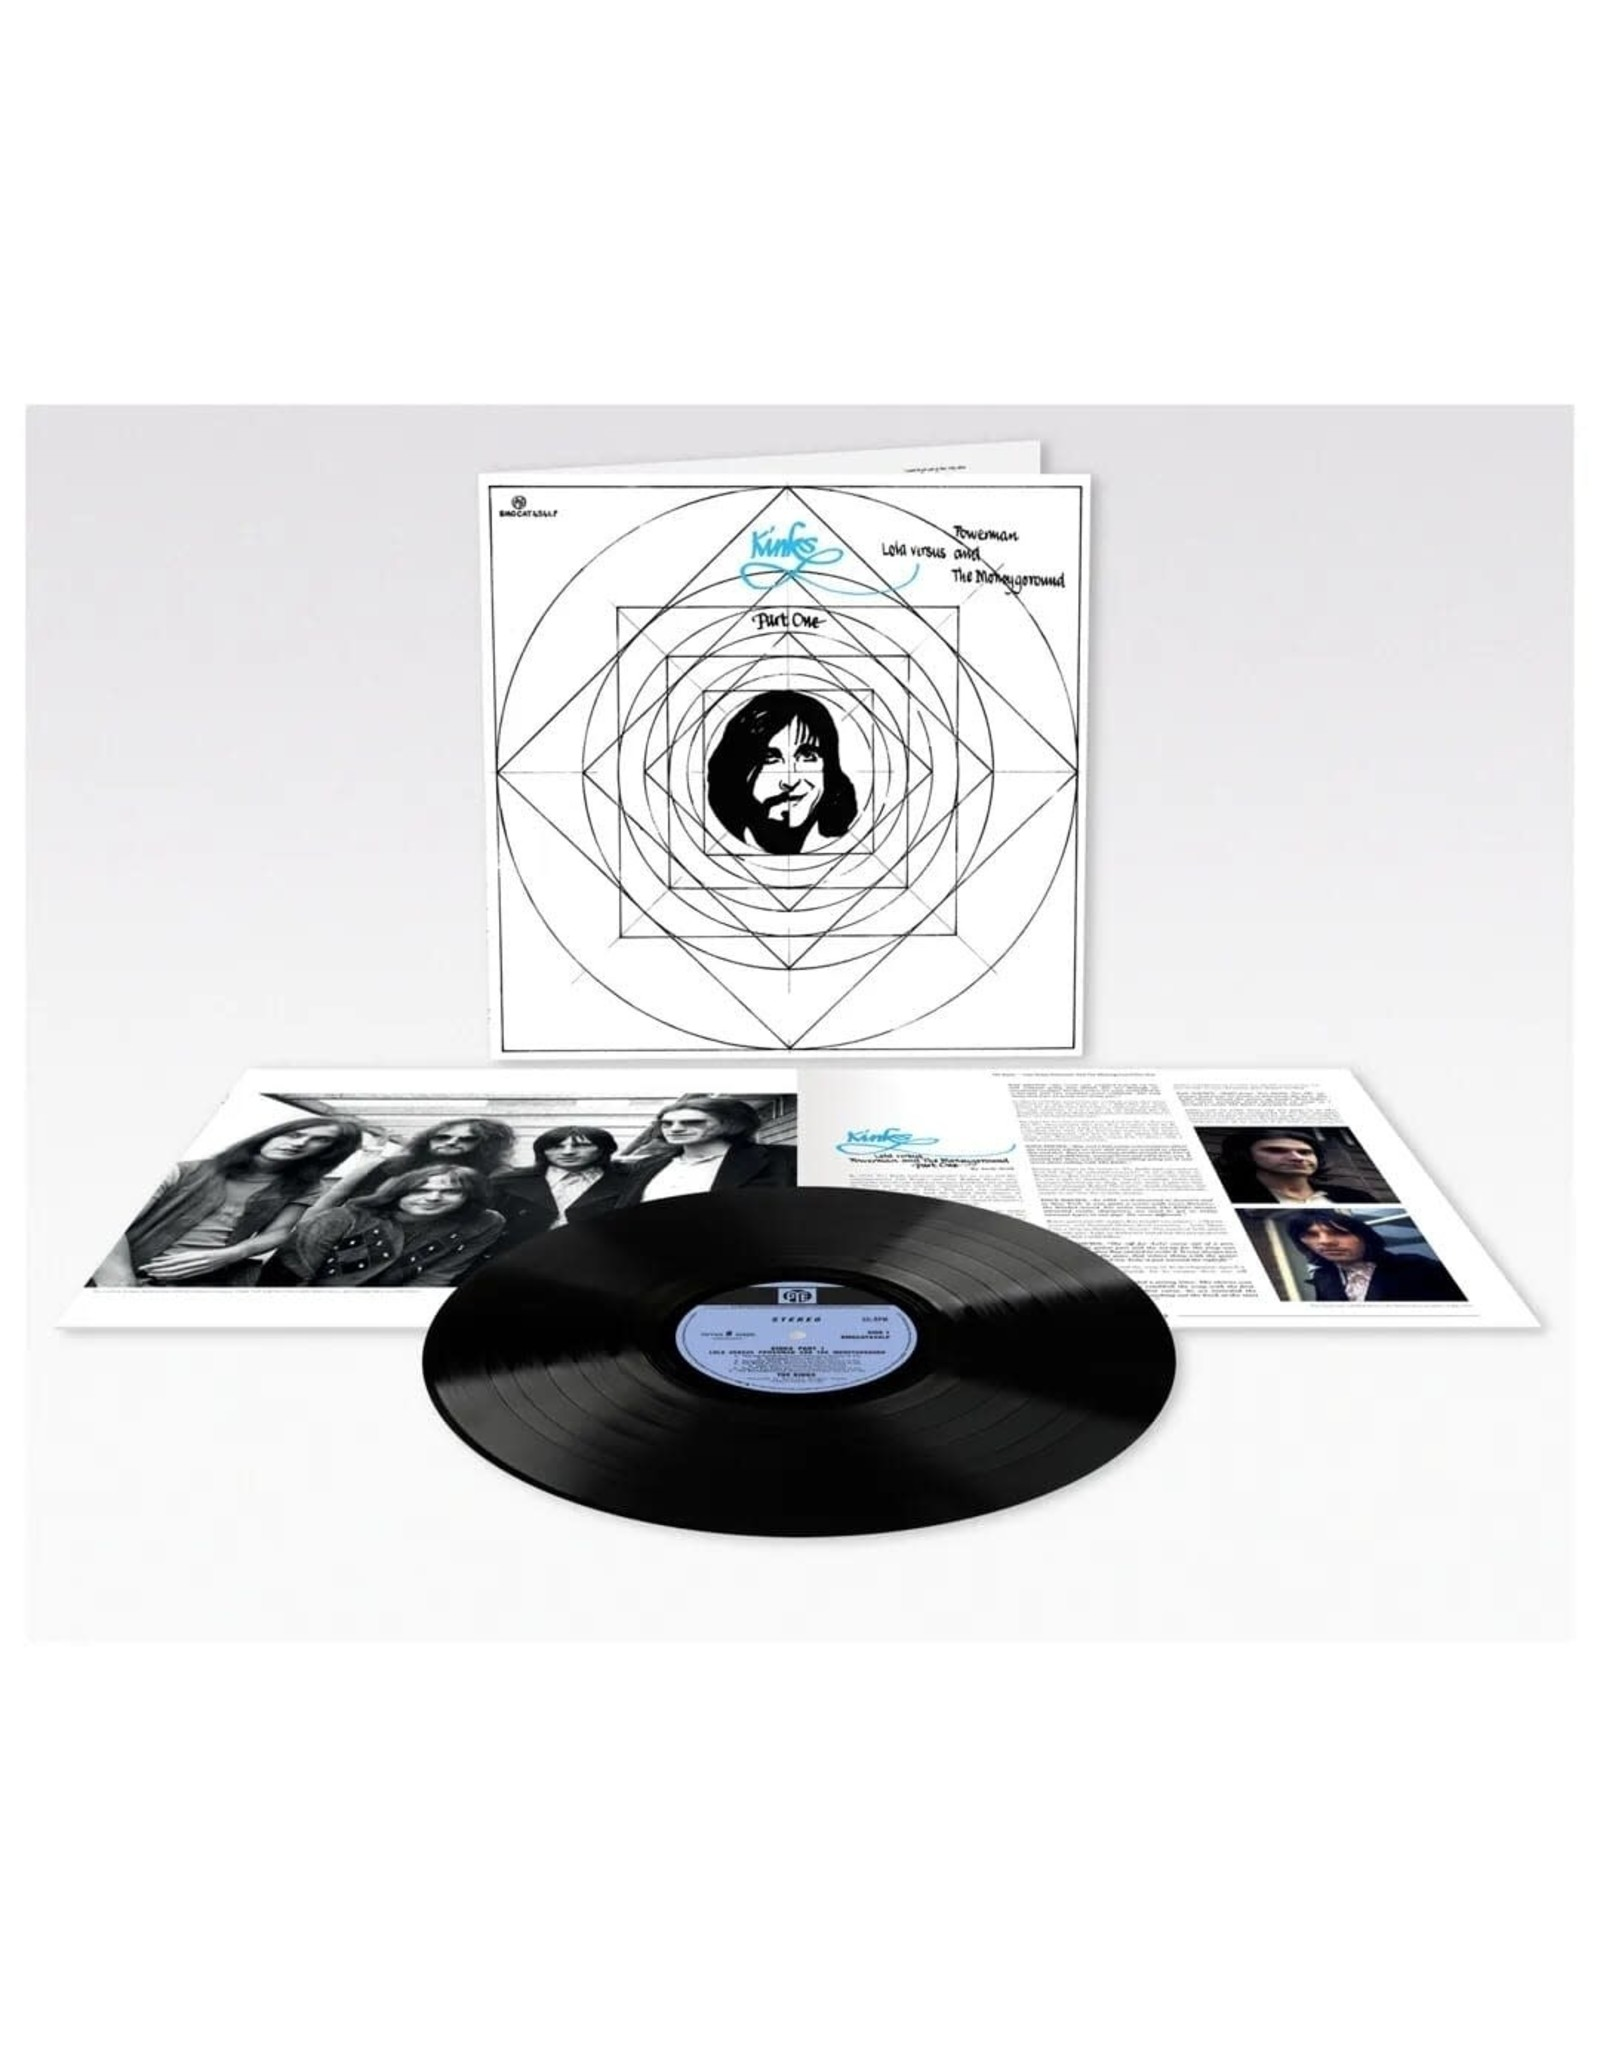 Sanctuary Kinks: Lola vs Powerman & The Moneygoground Part One LP